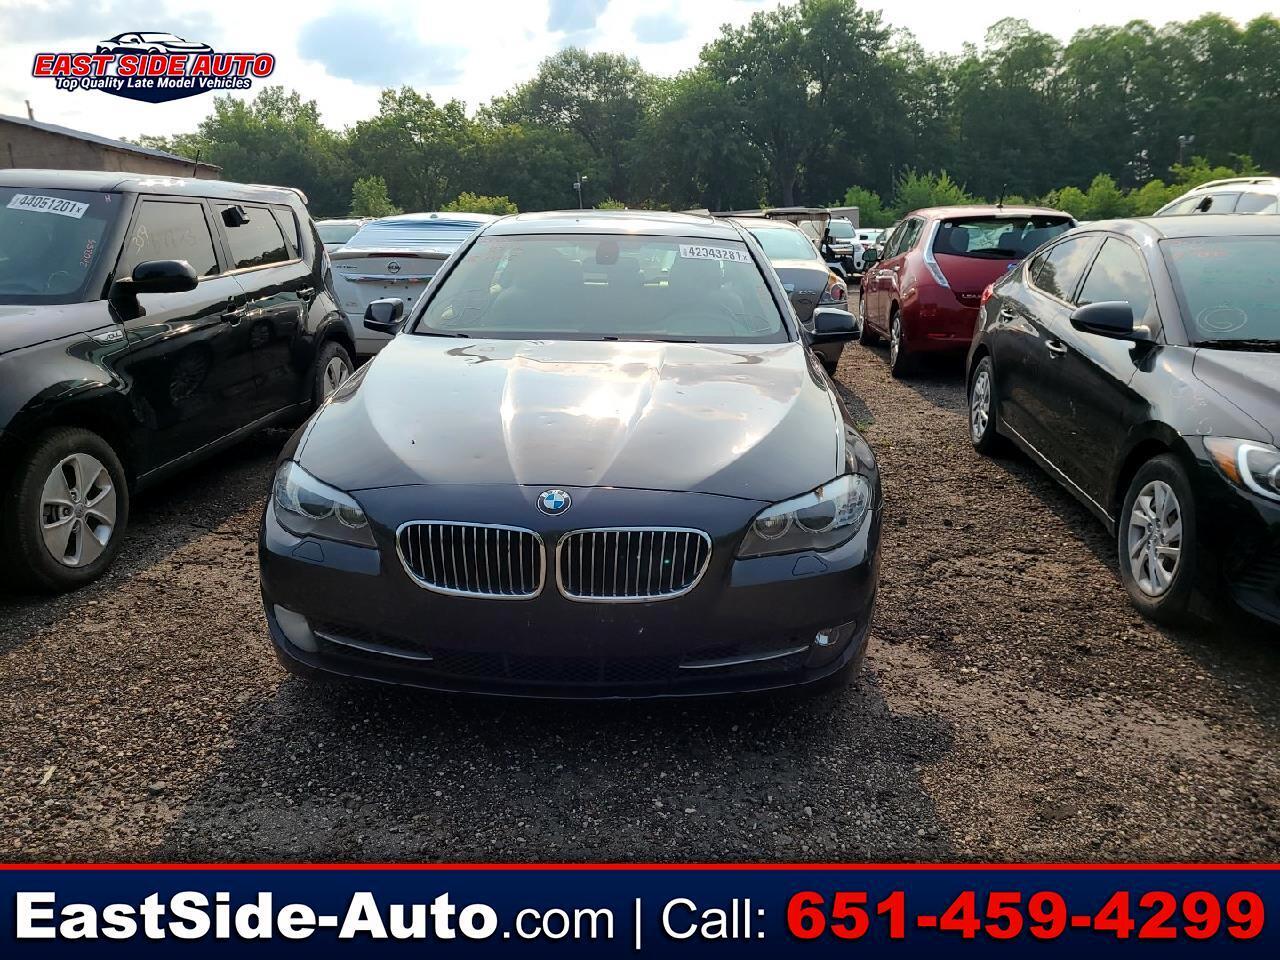 BMW 5 Series 4dr Sdn 535i RWD 2012